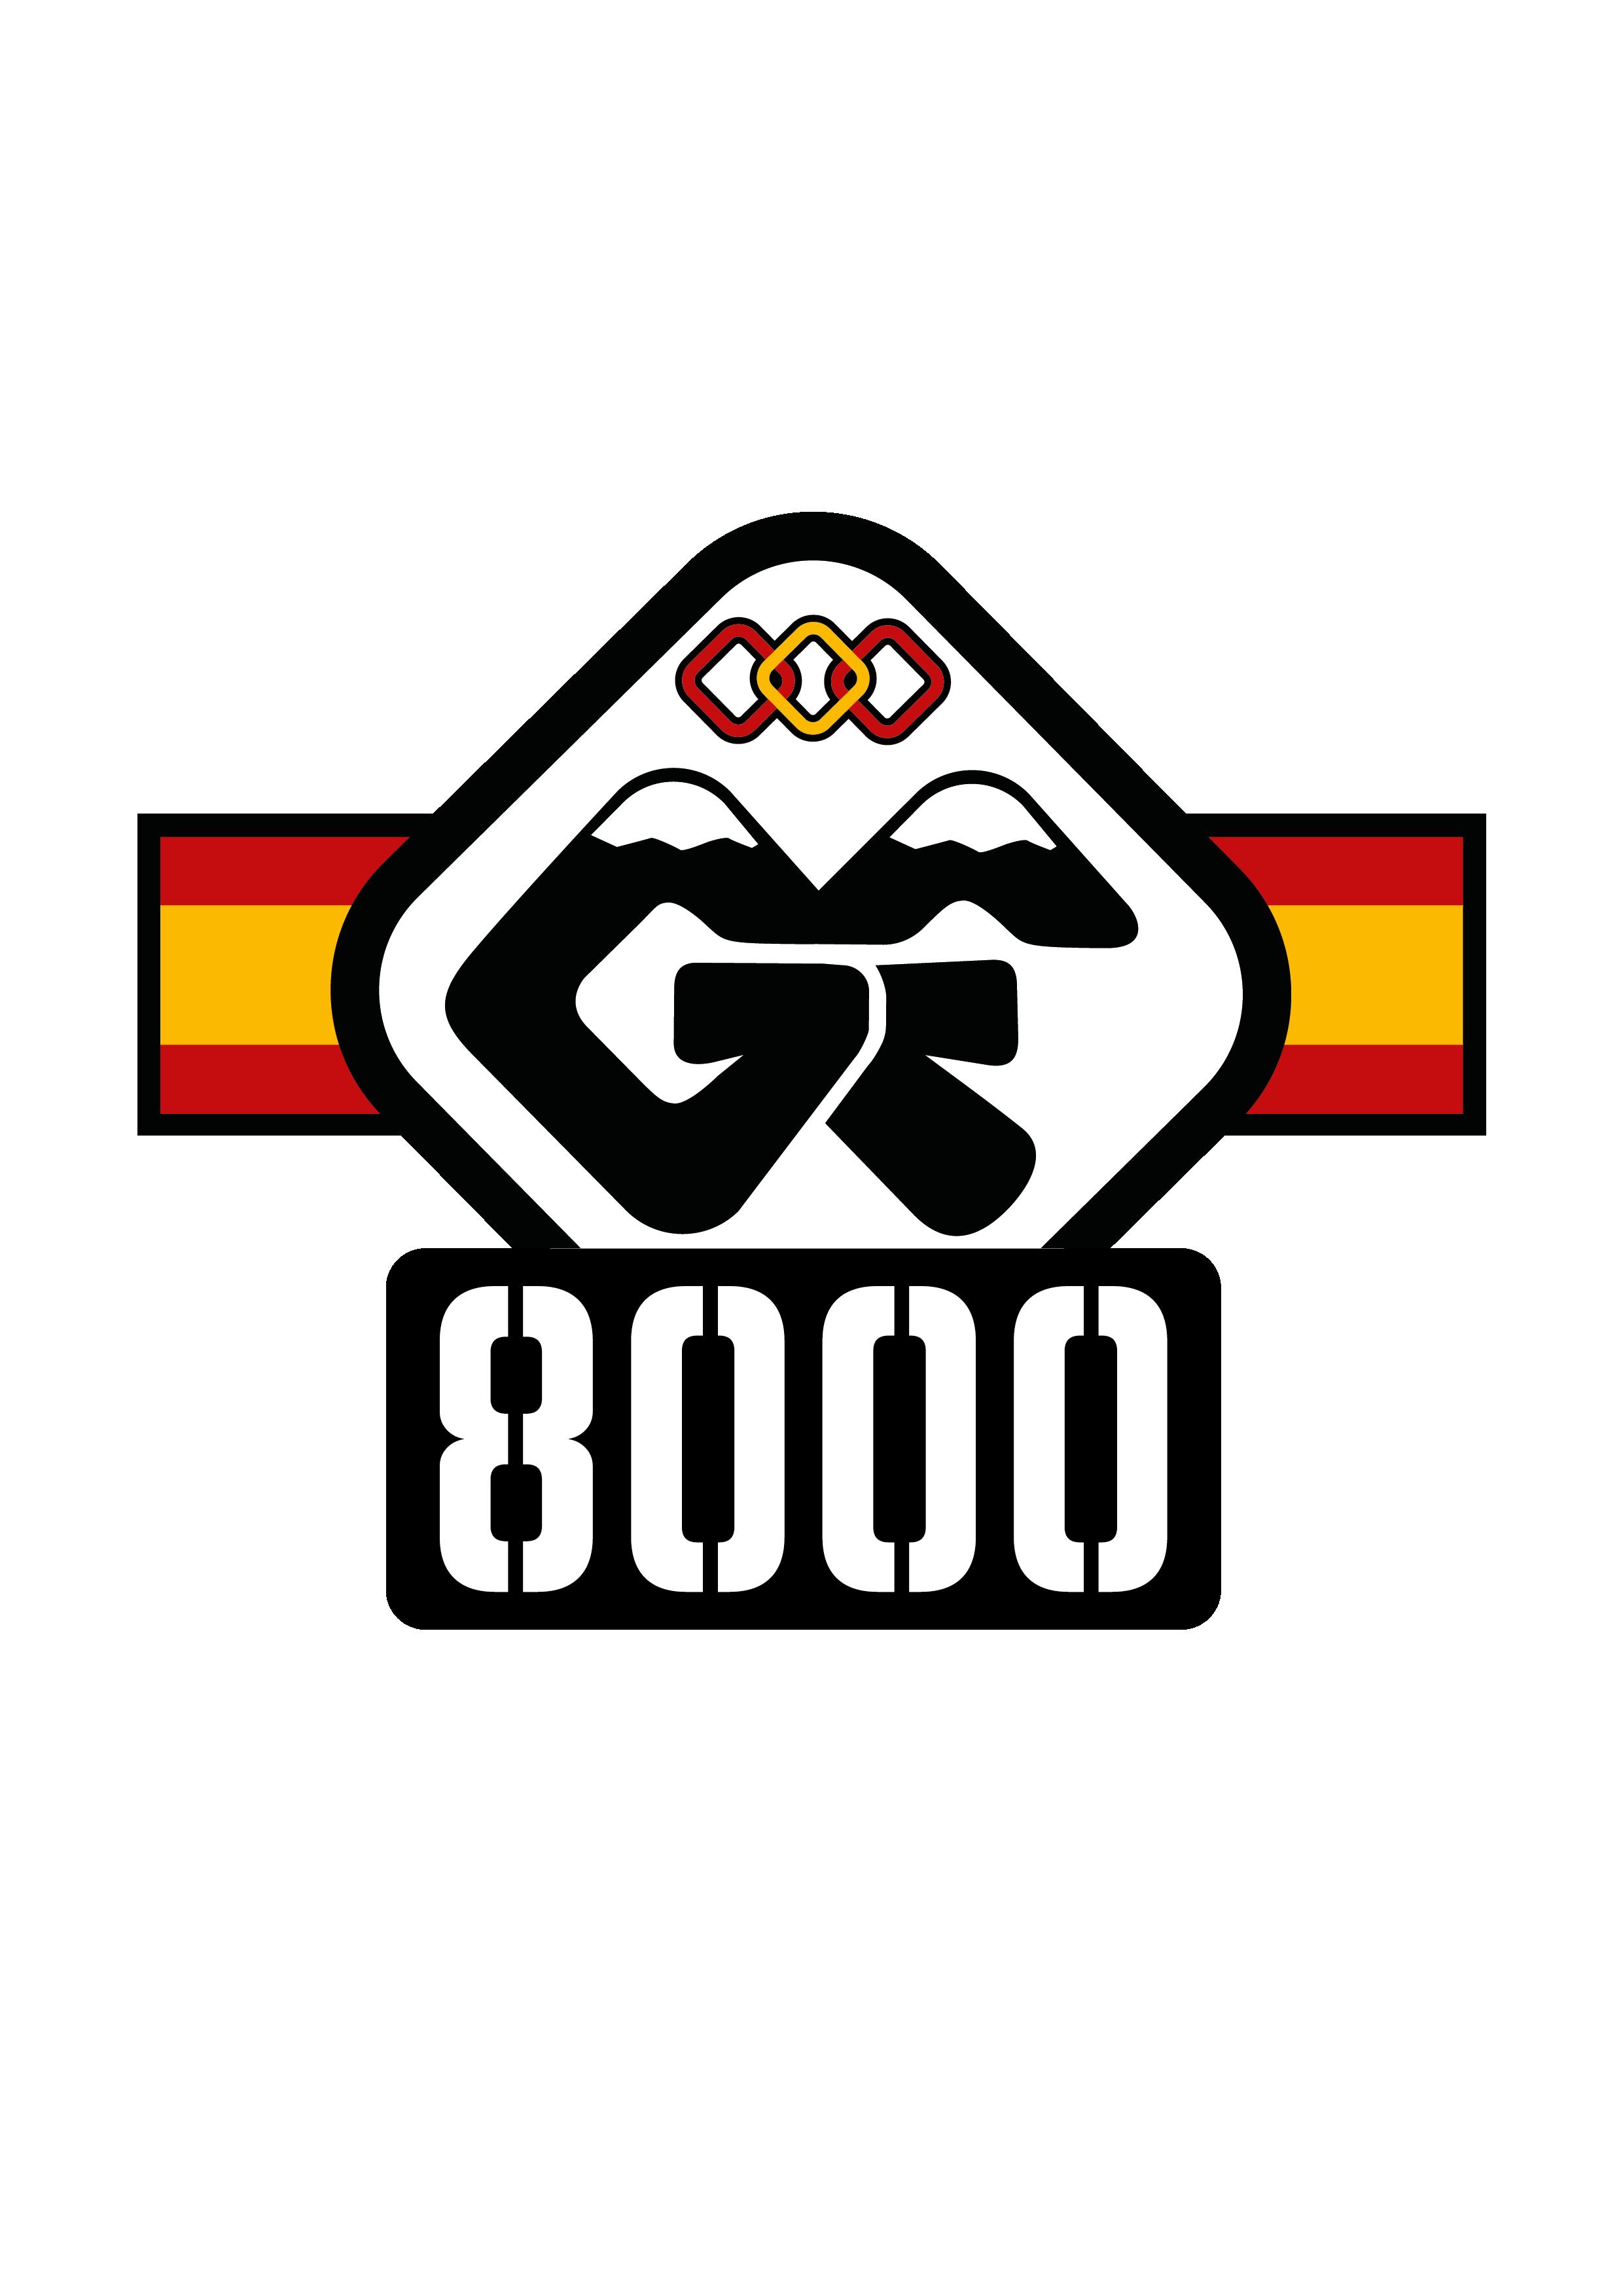 GRAN FONDO 8000. PRUEBA DEPORTIVA.